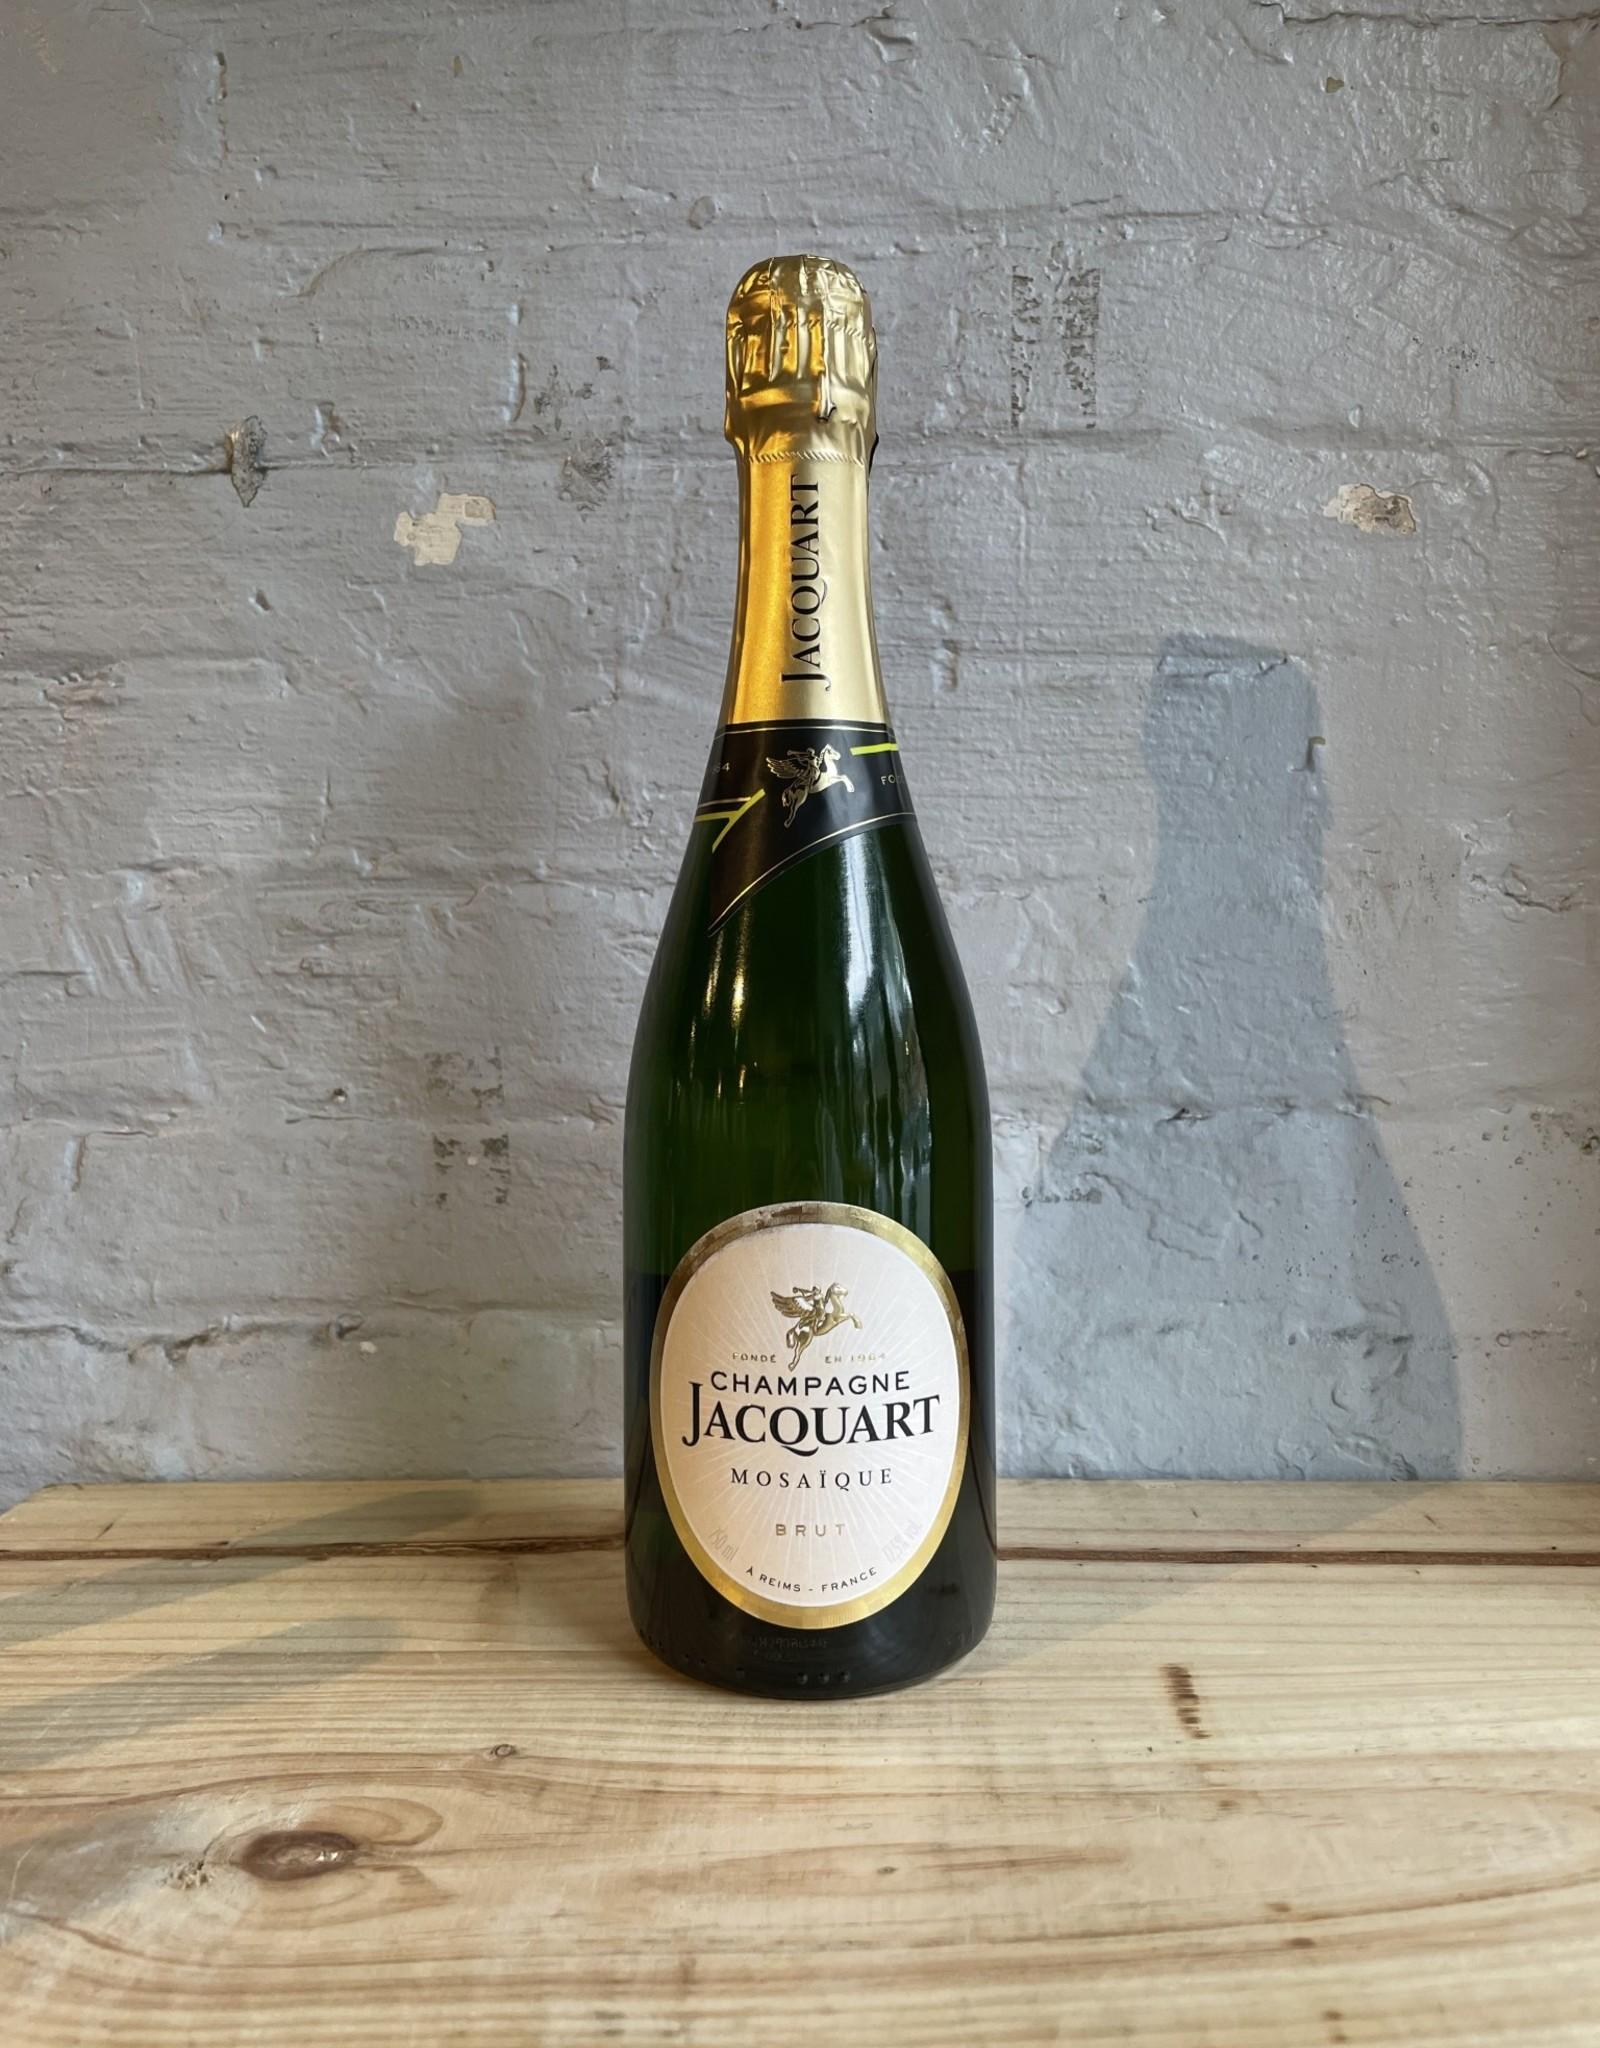 Wine NV Jacquart Brut Mosaique - Reims, Champagne, France (750ml)